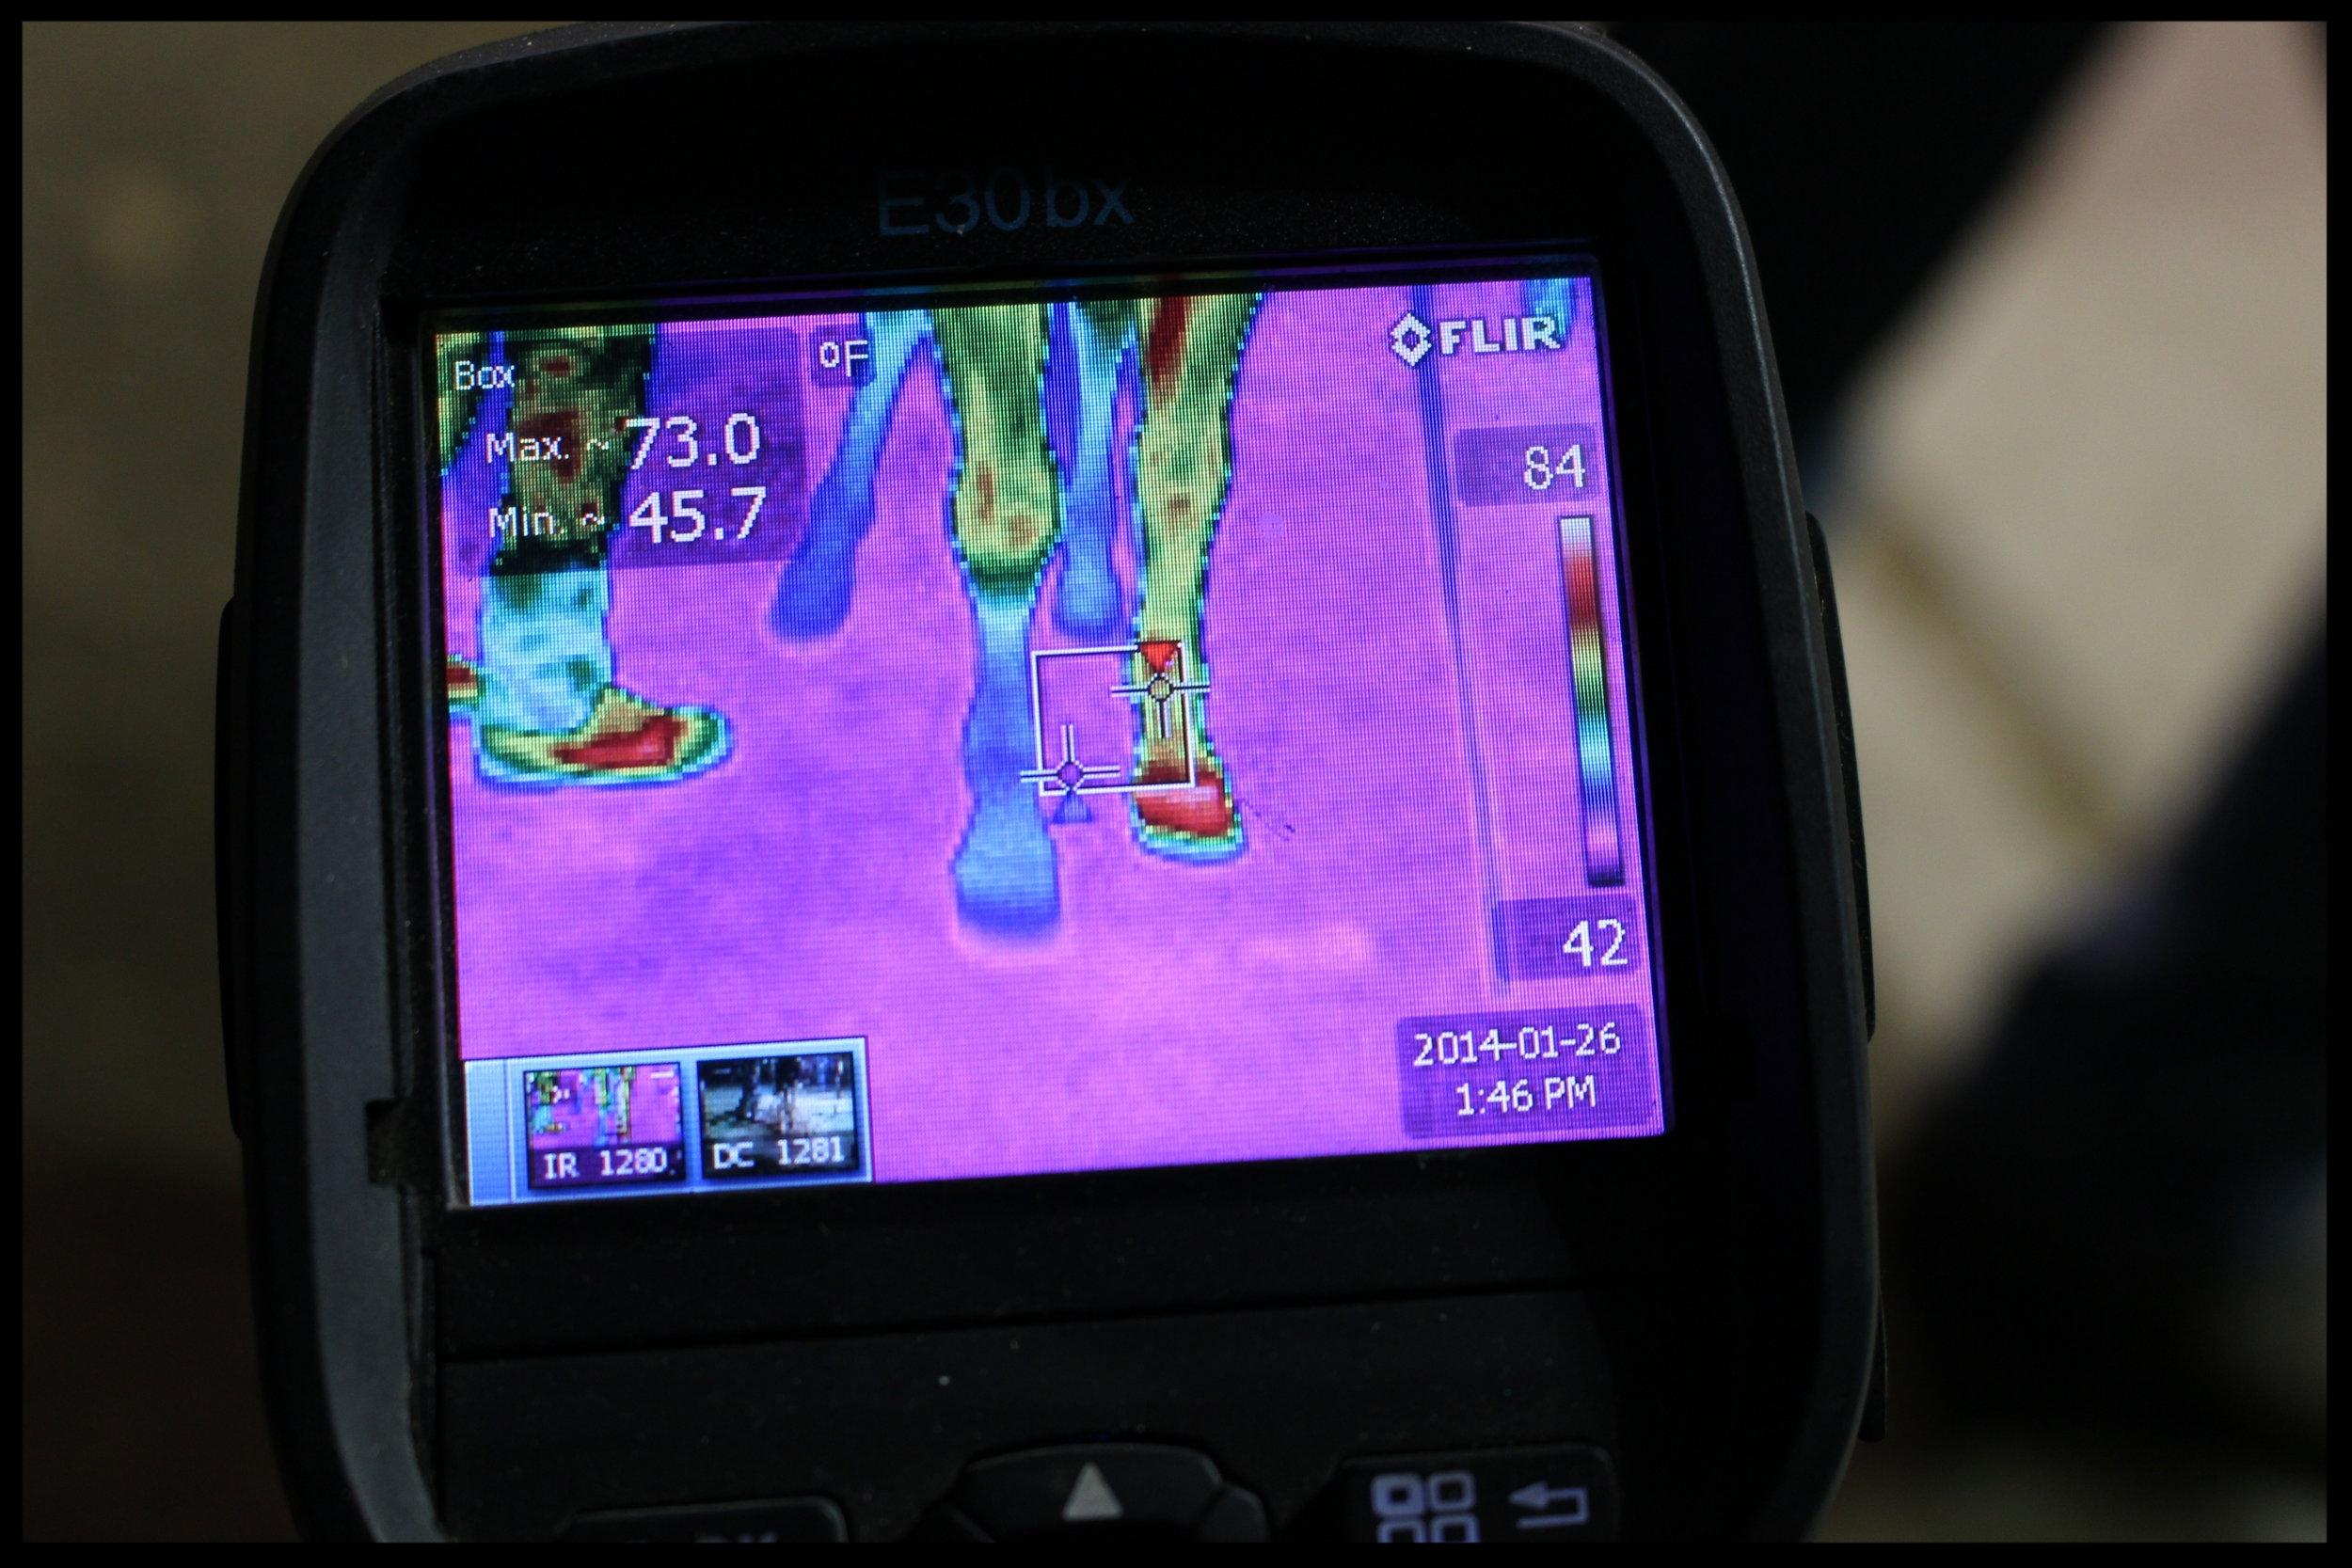 10 EFT Jan. 2014 Thermal Image of circulation in lame legs and hooves.JPG